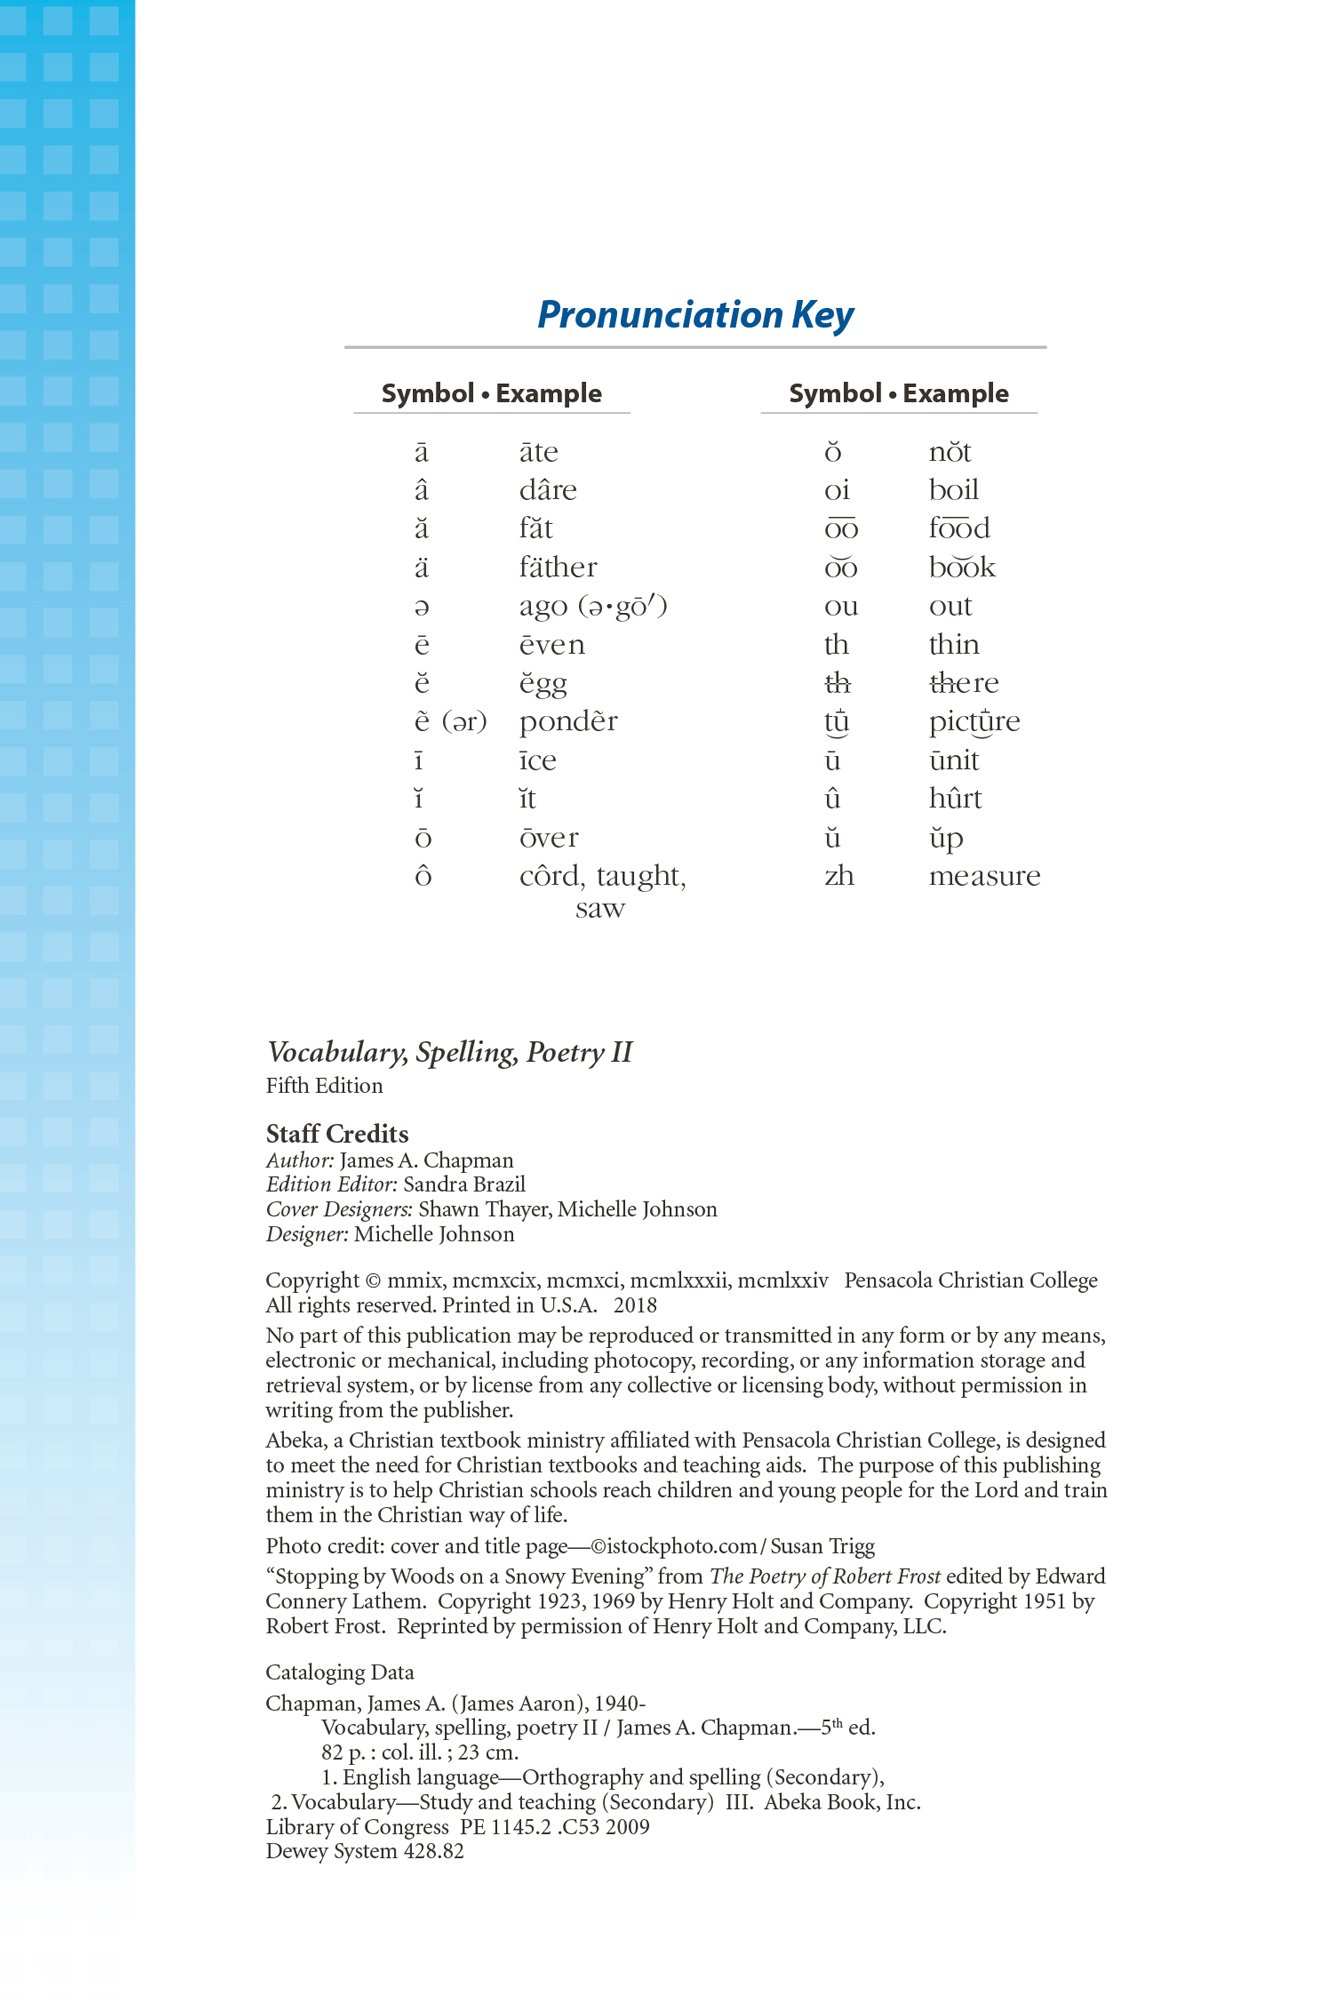 Vocabulary Spelling Poetry Ii James A Chapman Amazon Books